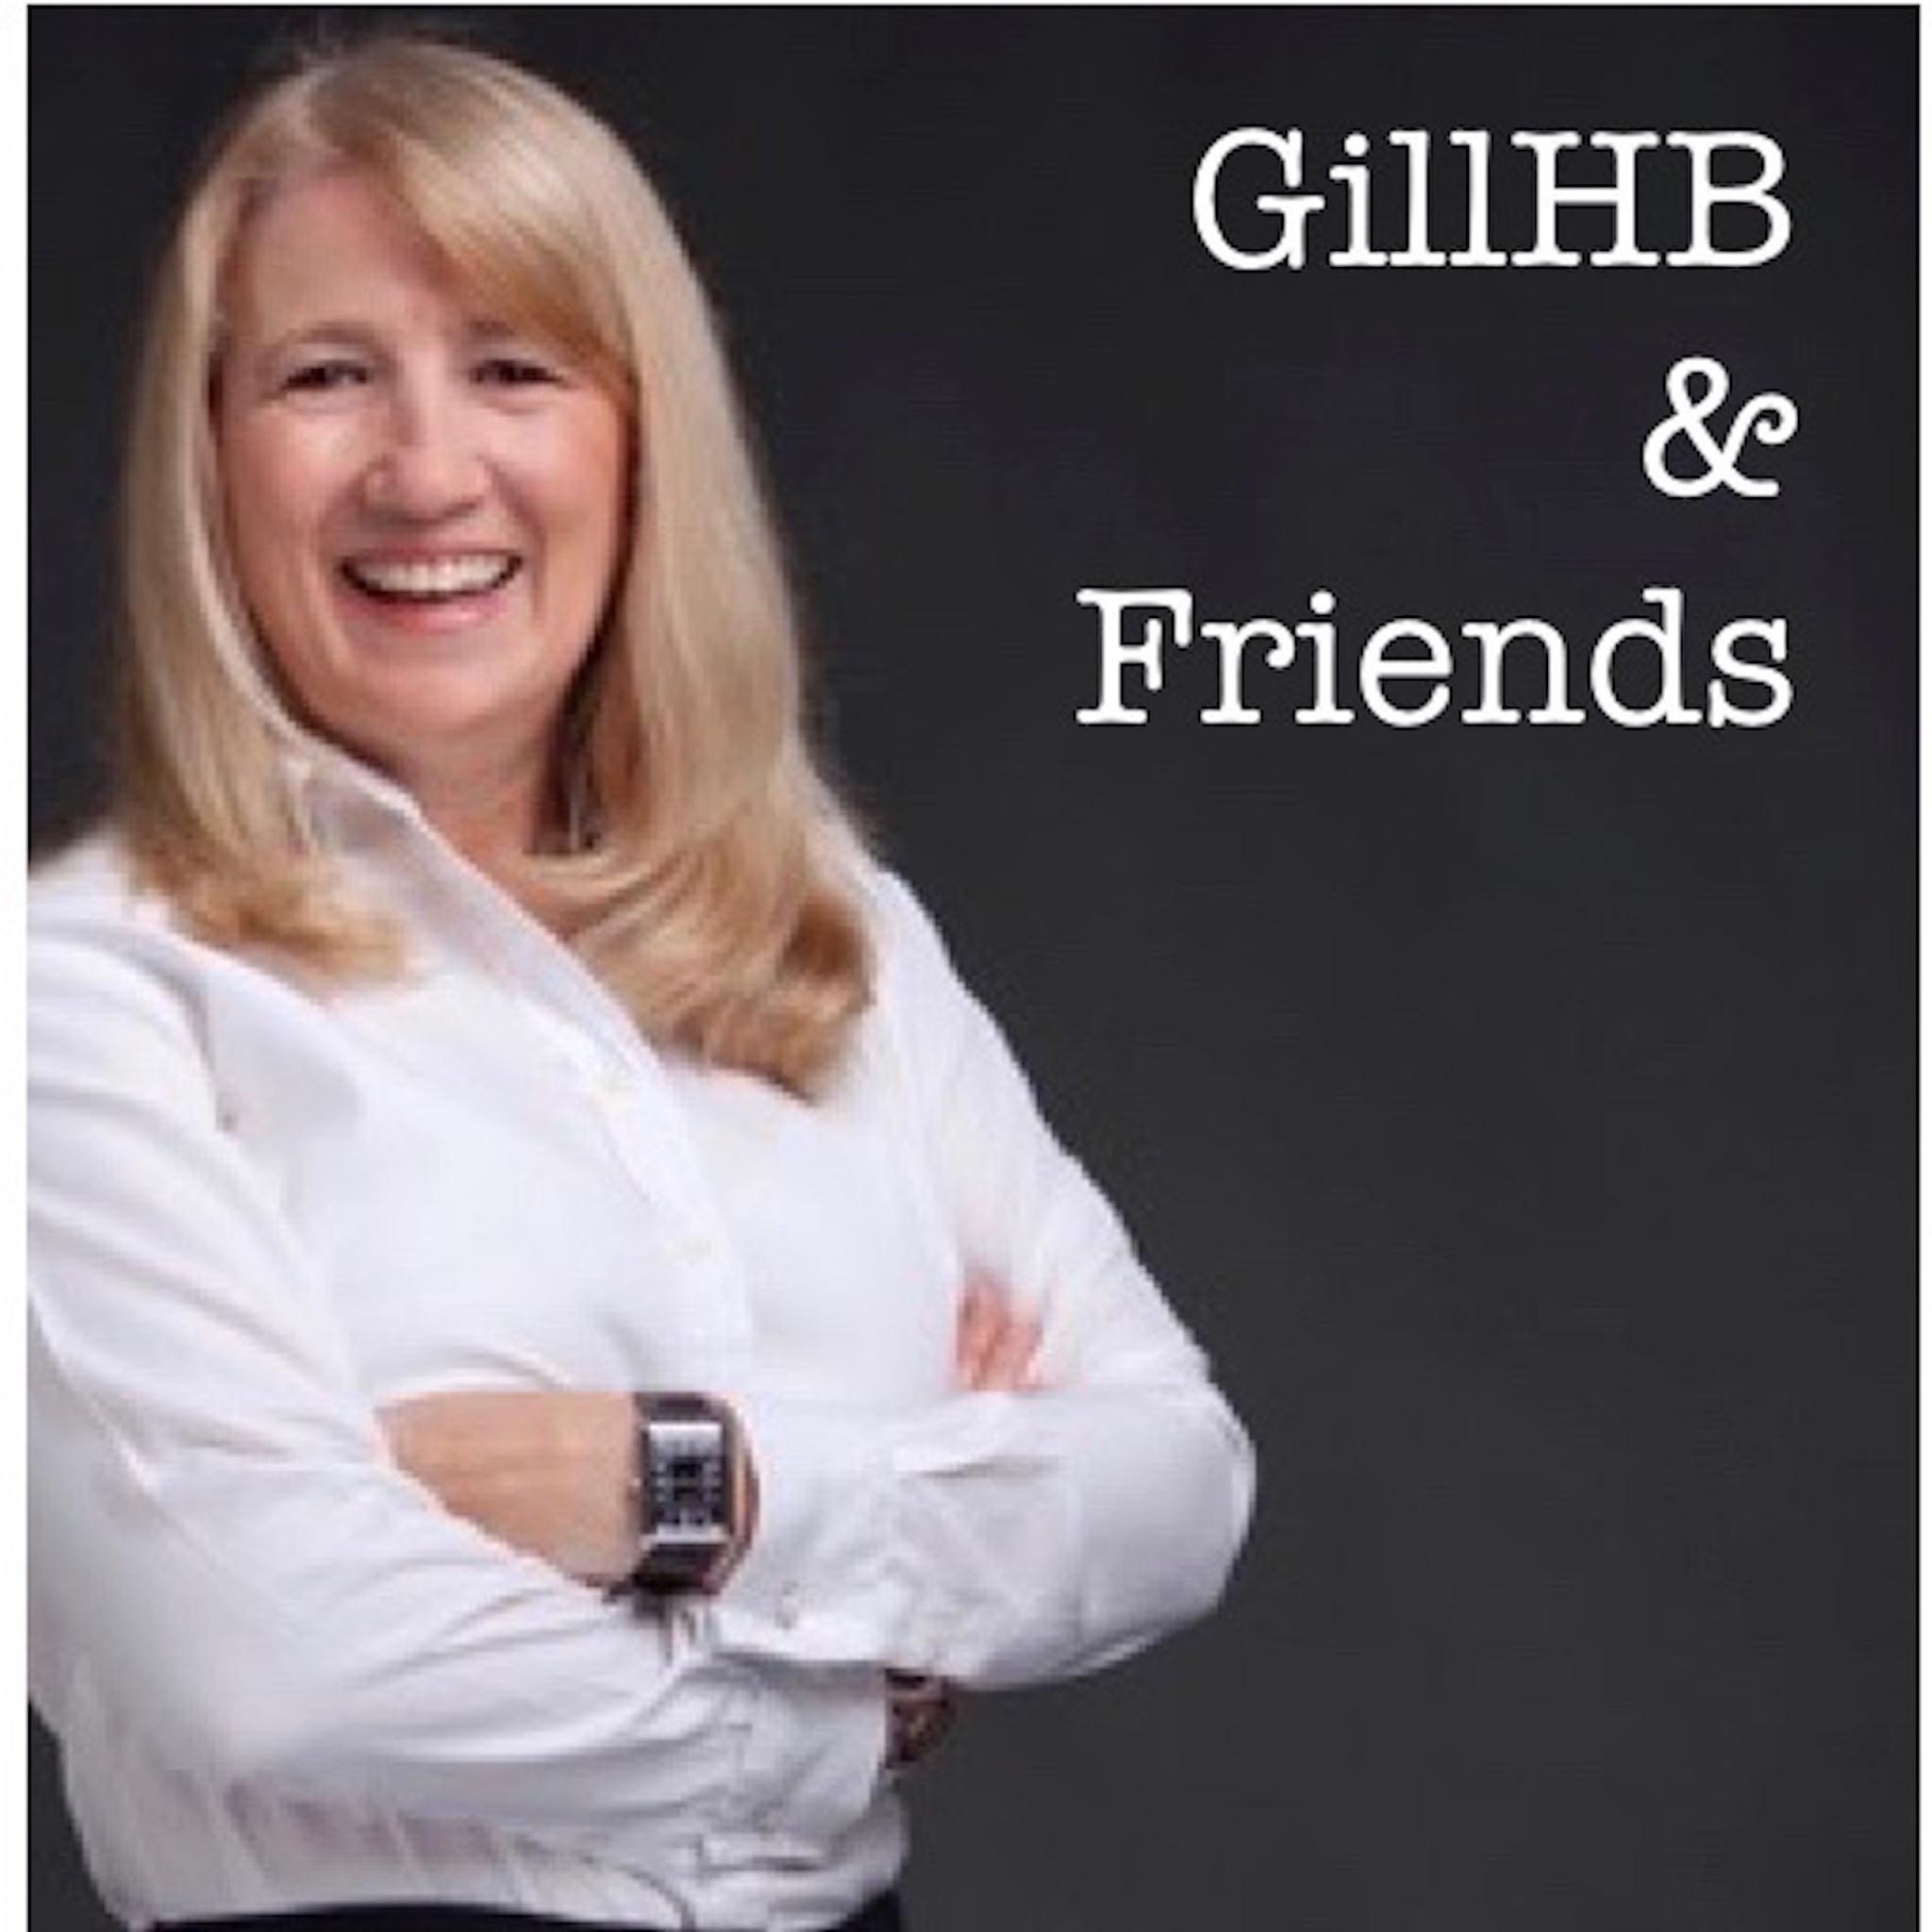 GillHB & Friends podcast show art